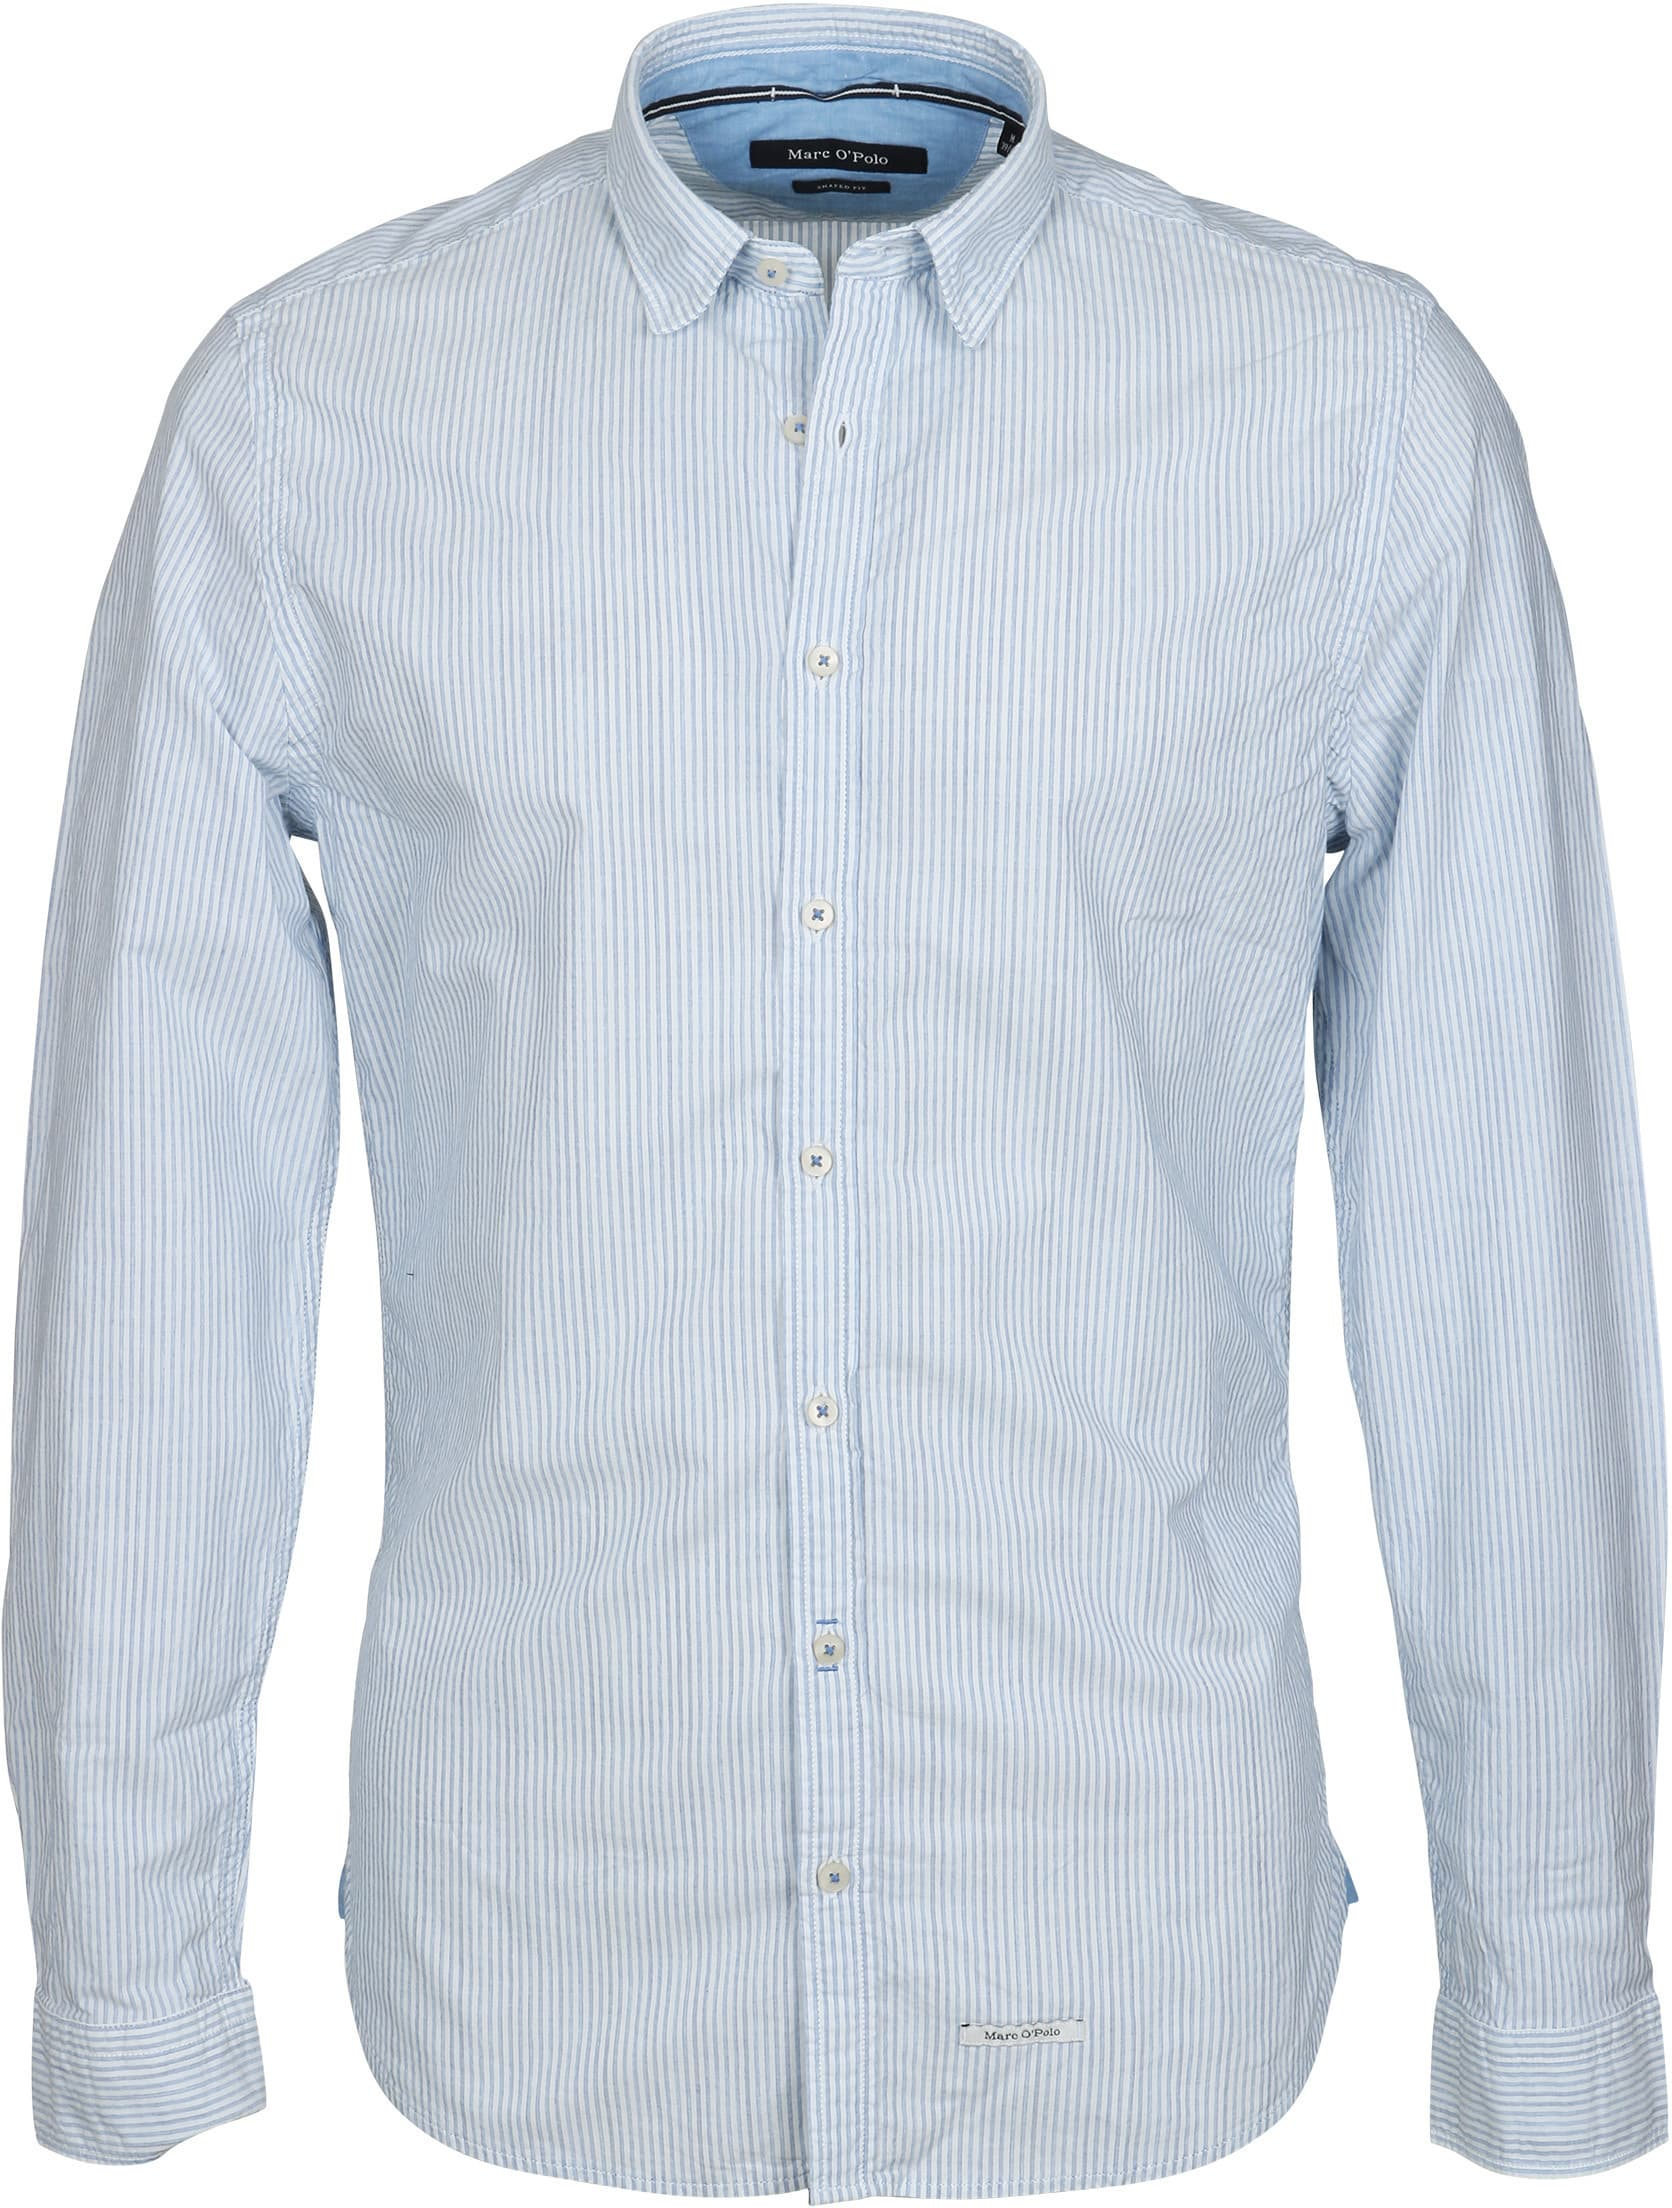 finest selection daf19 df6bd Marc O'Polo Shirt Stripes M22741542216 order online | Suitable